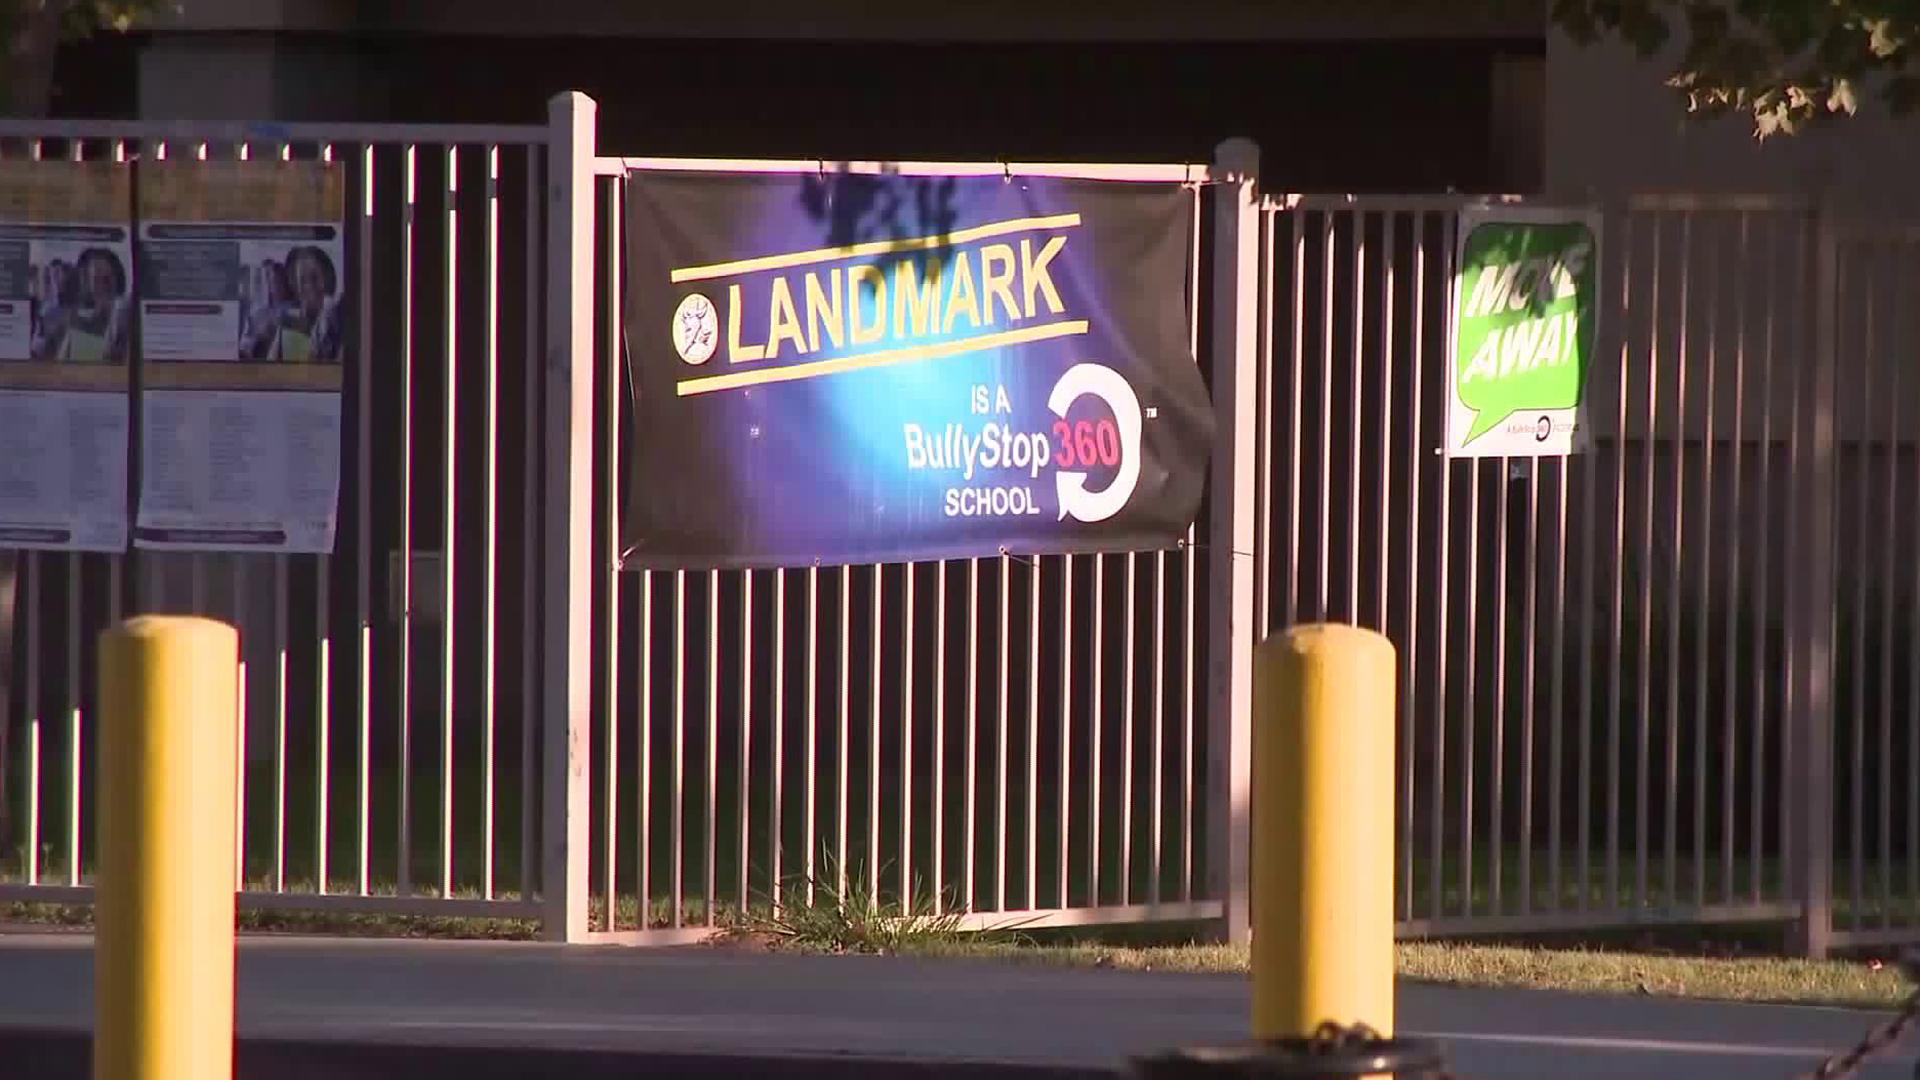 Landmark Middle School in Moreno Valley is seen on Sept. 17, 2019. (Credit: KTLA)